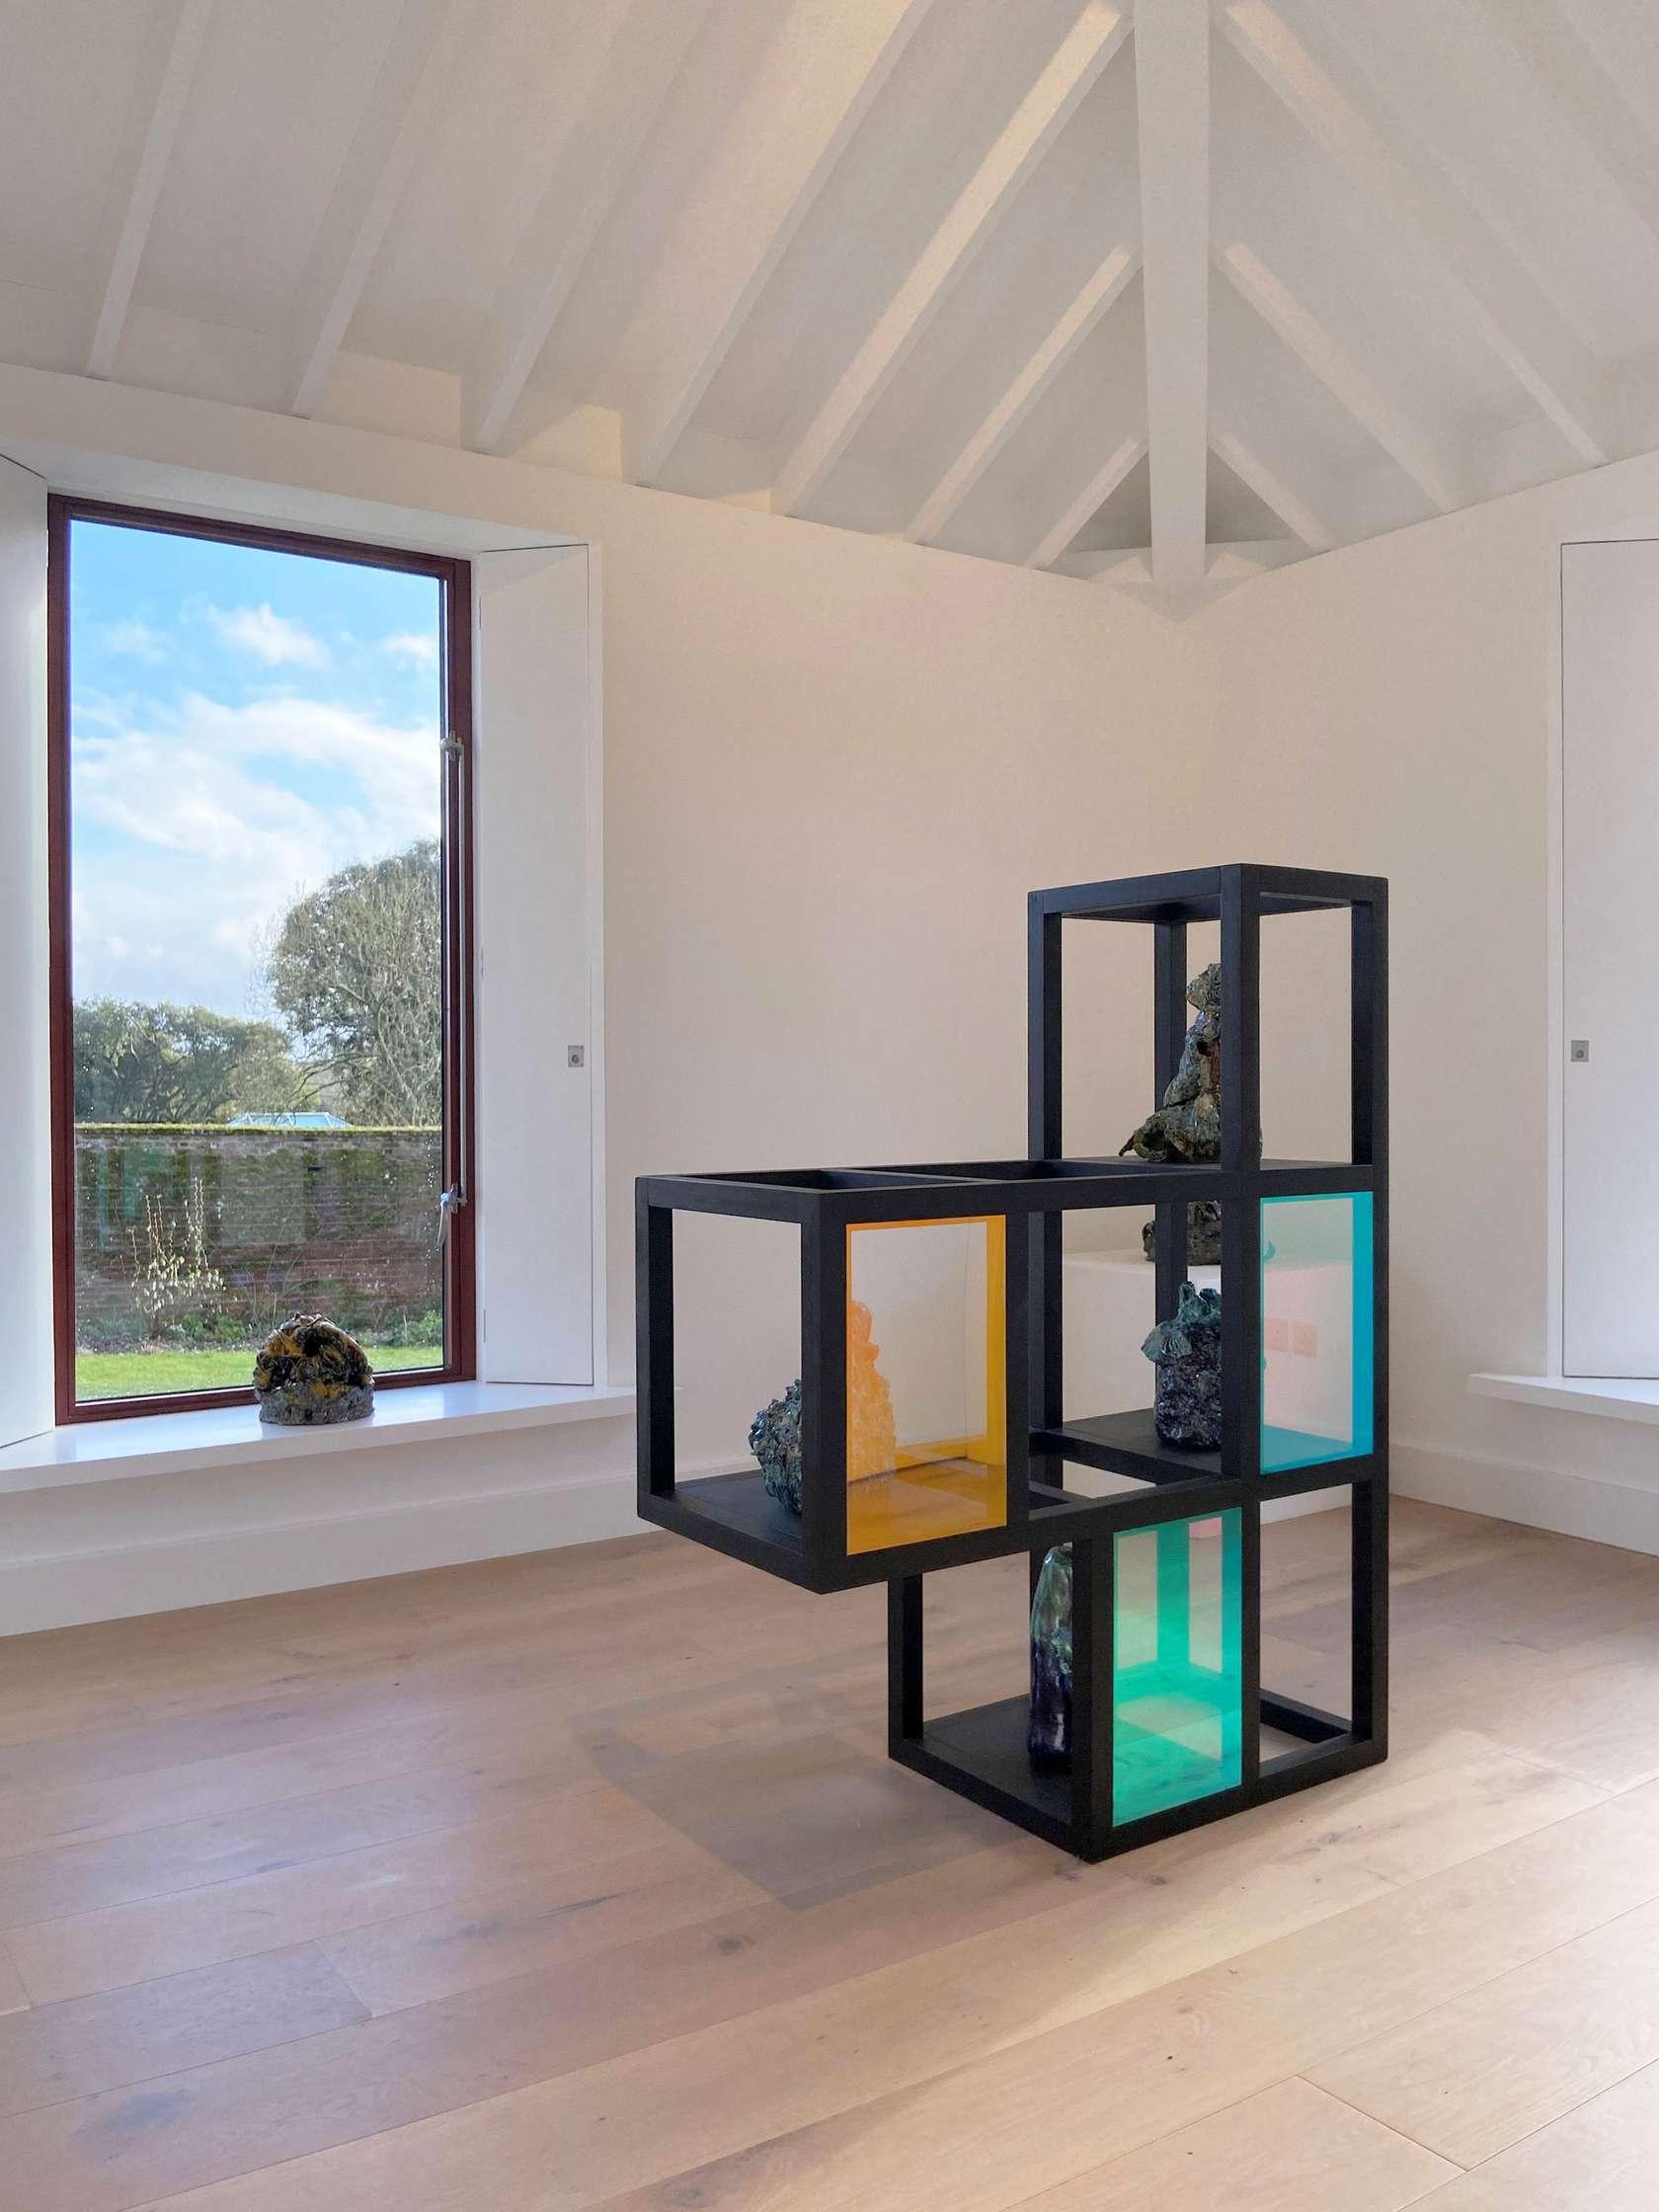 Salvatore Arancio Psychotropics New Art Centre, Salisbury (UK) 25 janvier  — 22 mars 2020